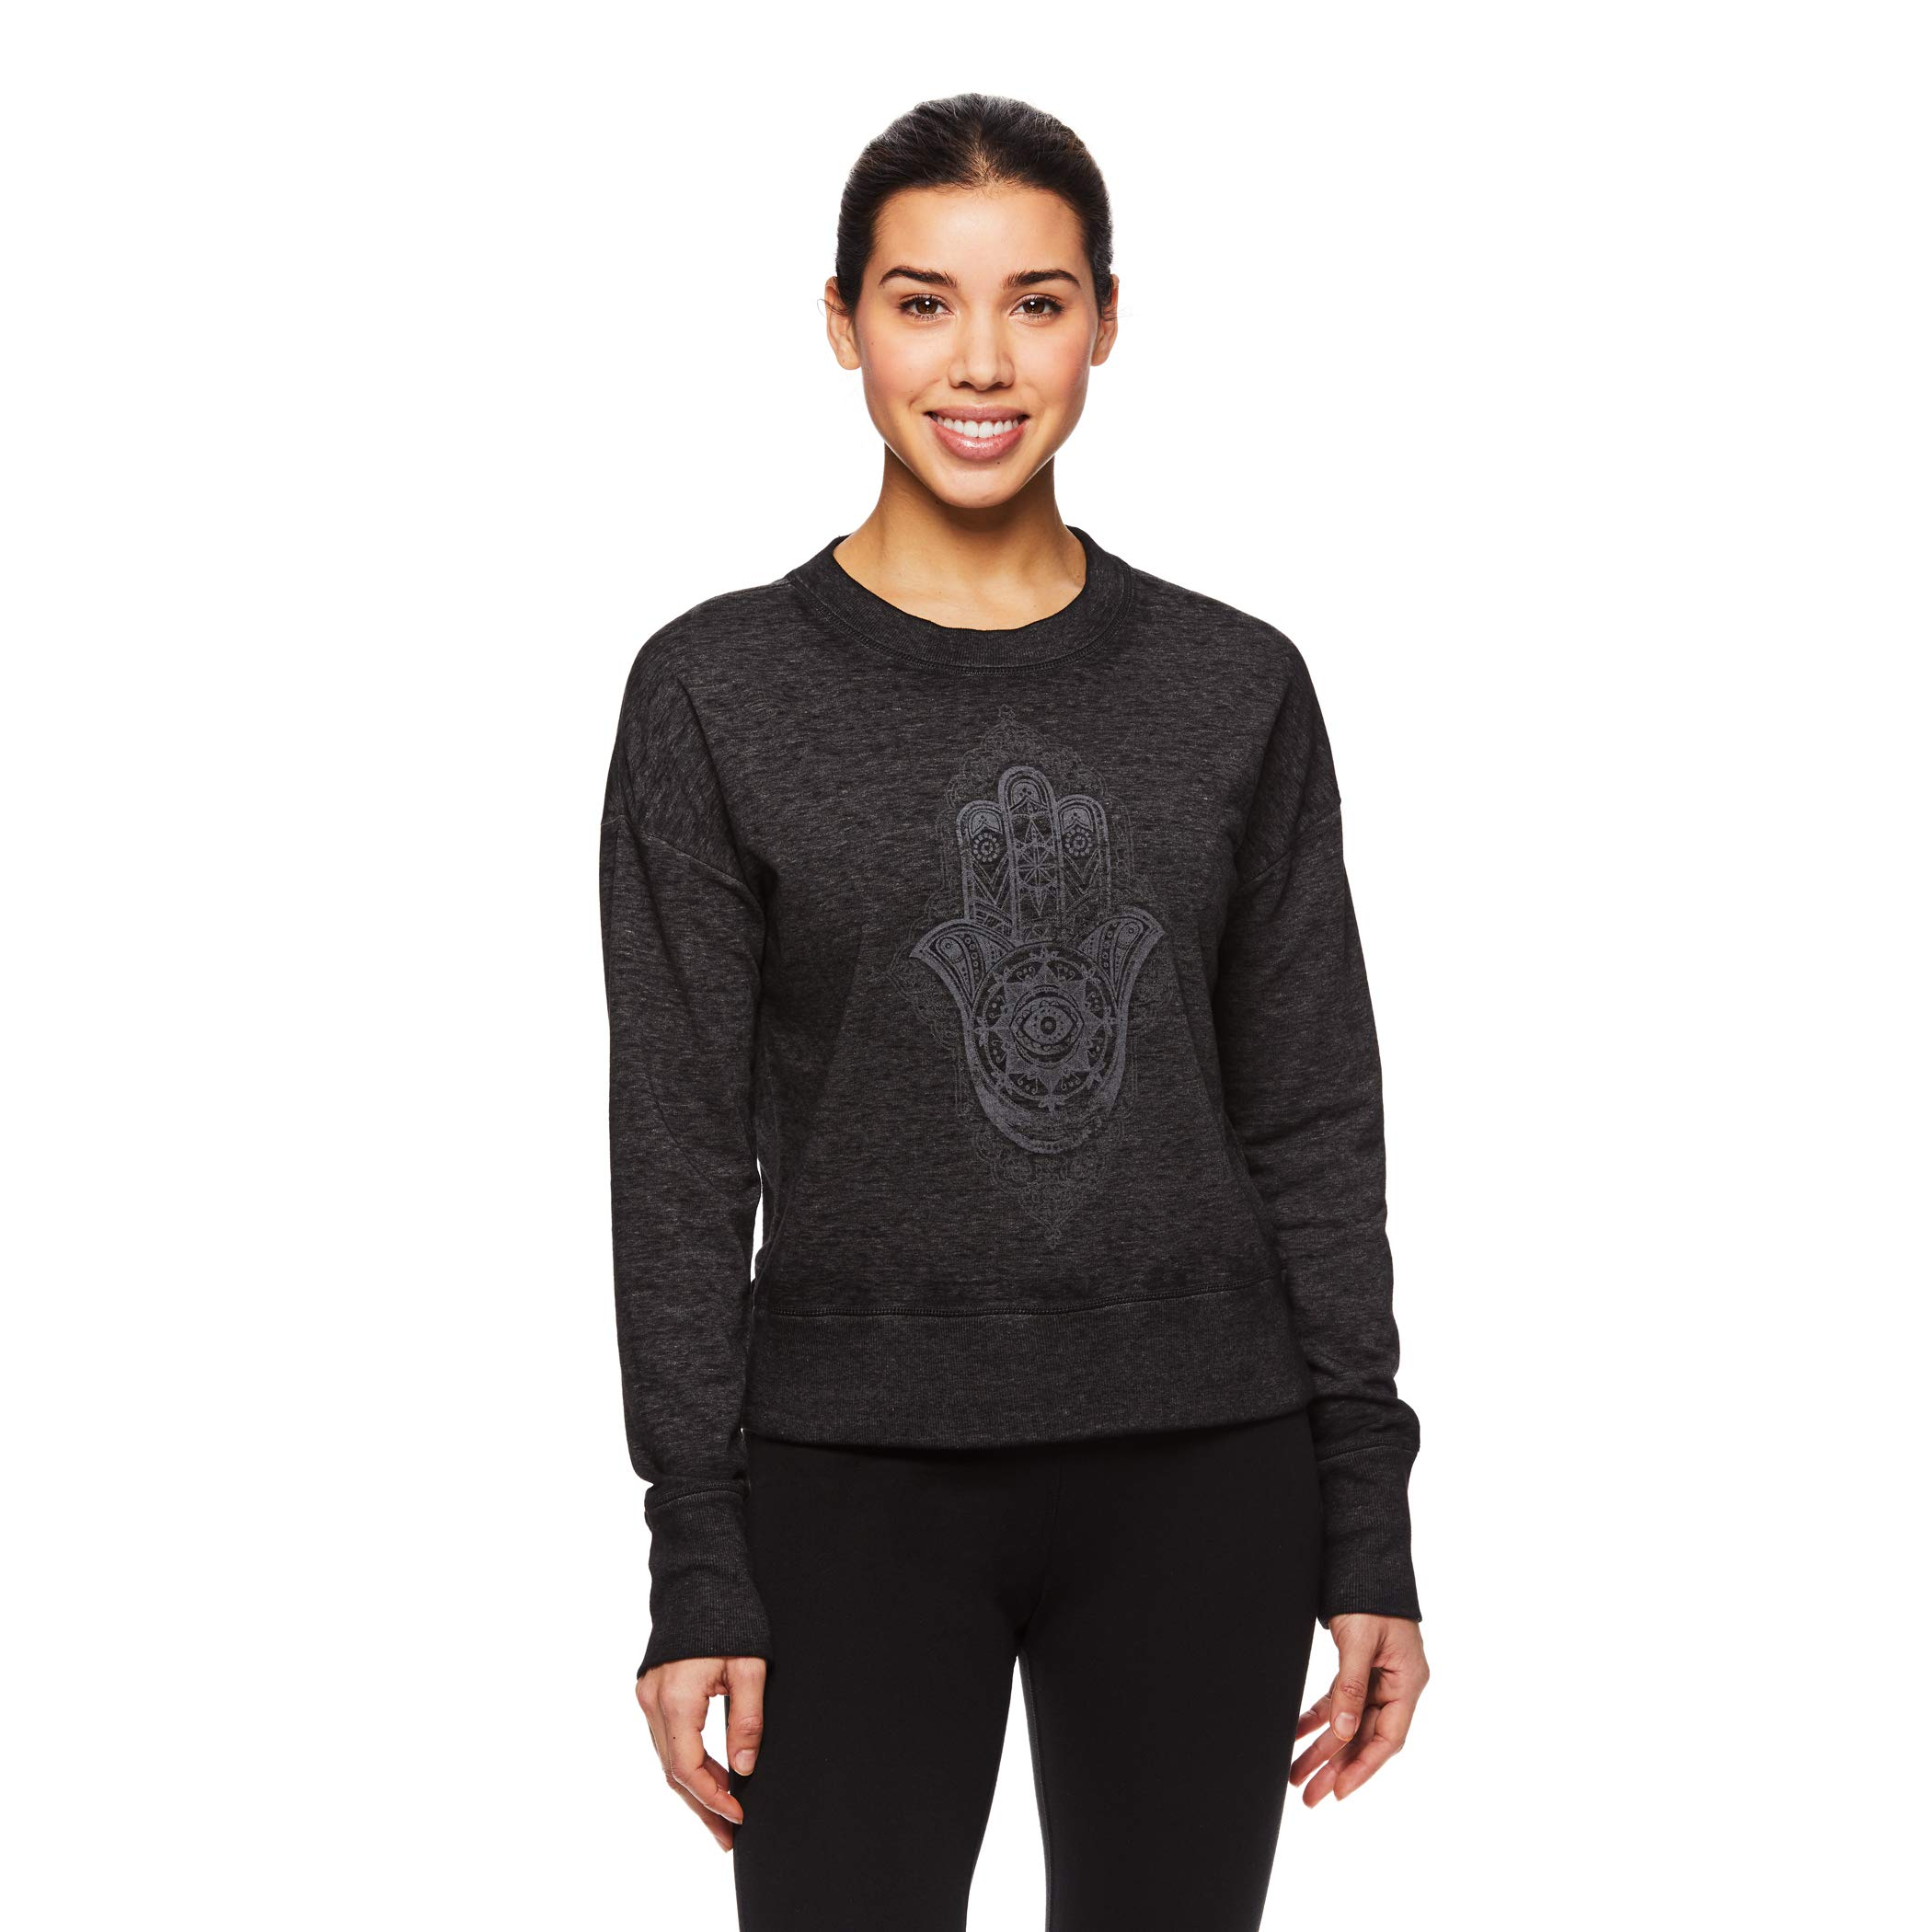 Gaiam Women's Pullover Fleece Yoga Sweatshirt - Long Sleeve Graphic Activewear Sweater - Black (Tap Shoe), X-Small by Gaiam